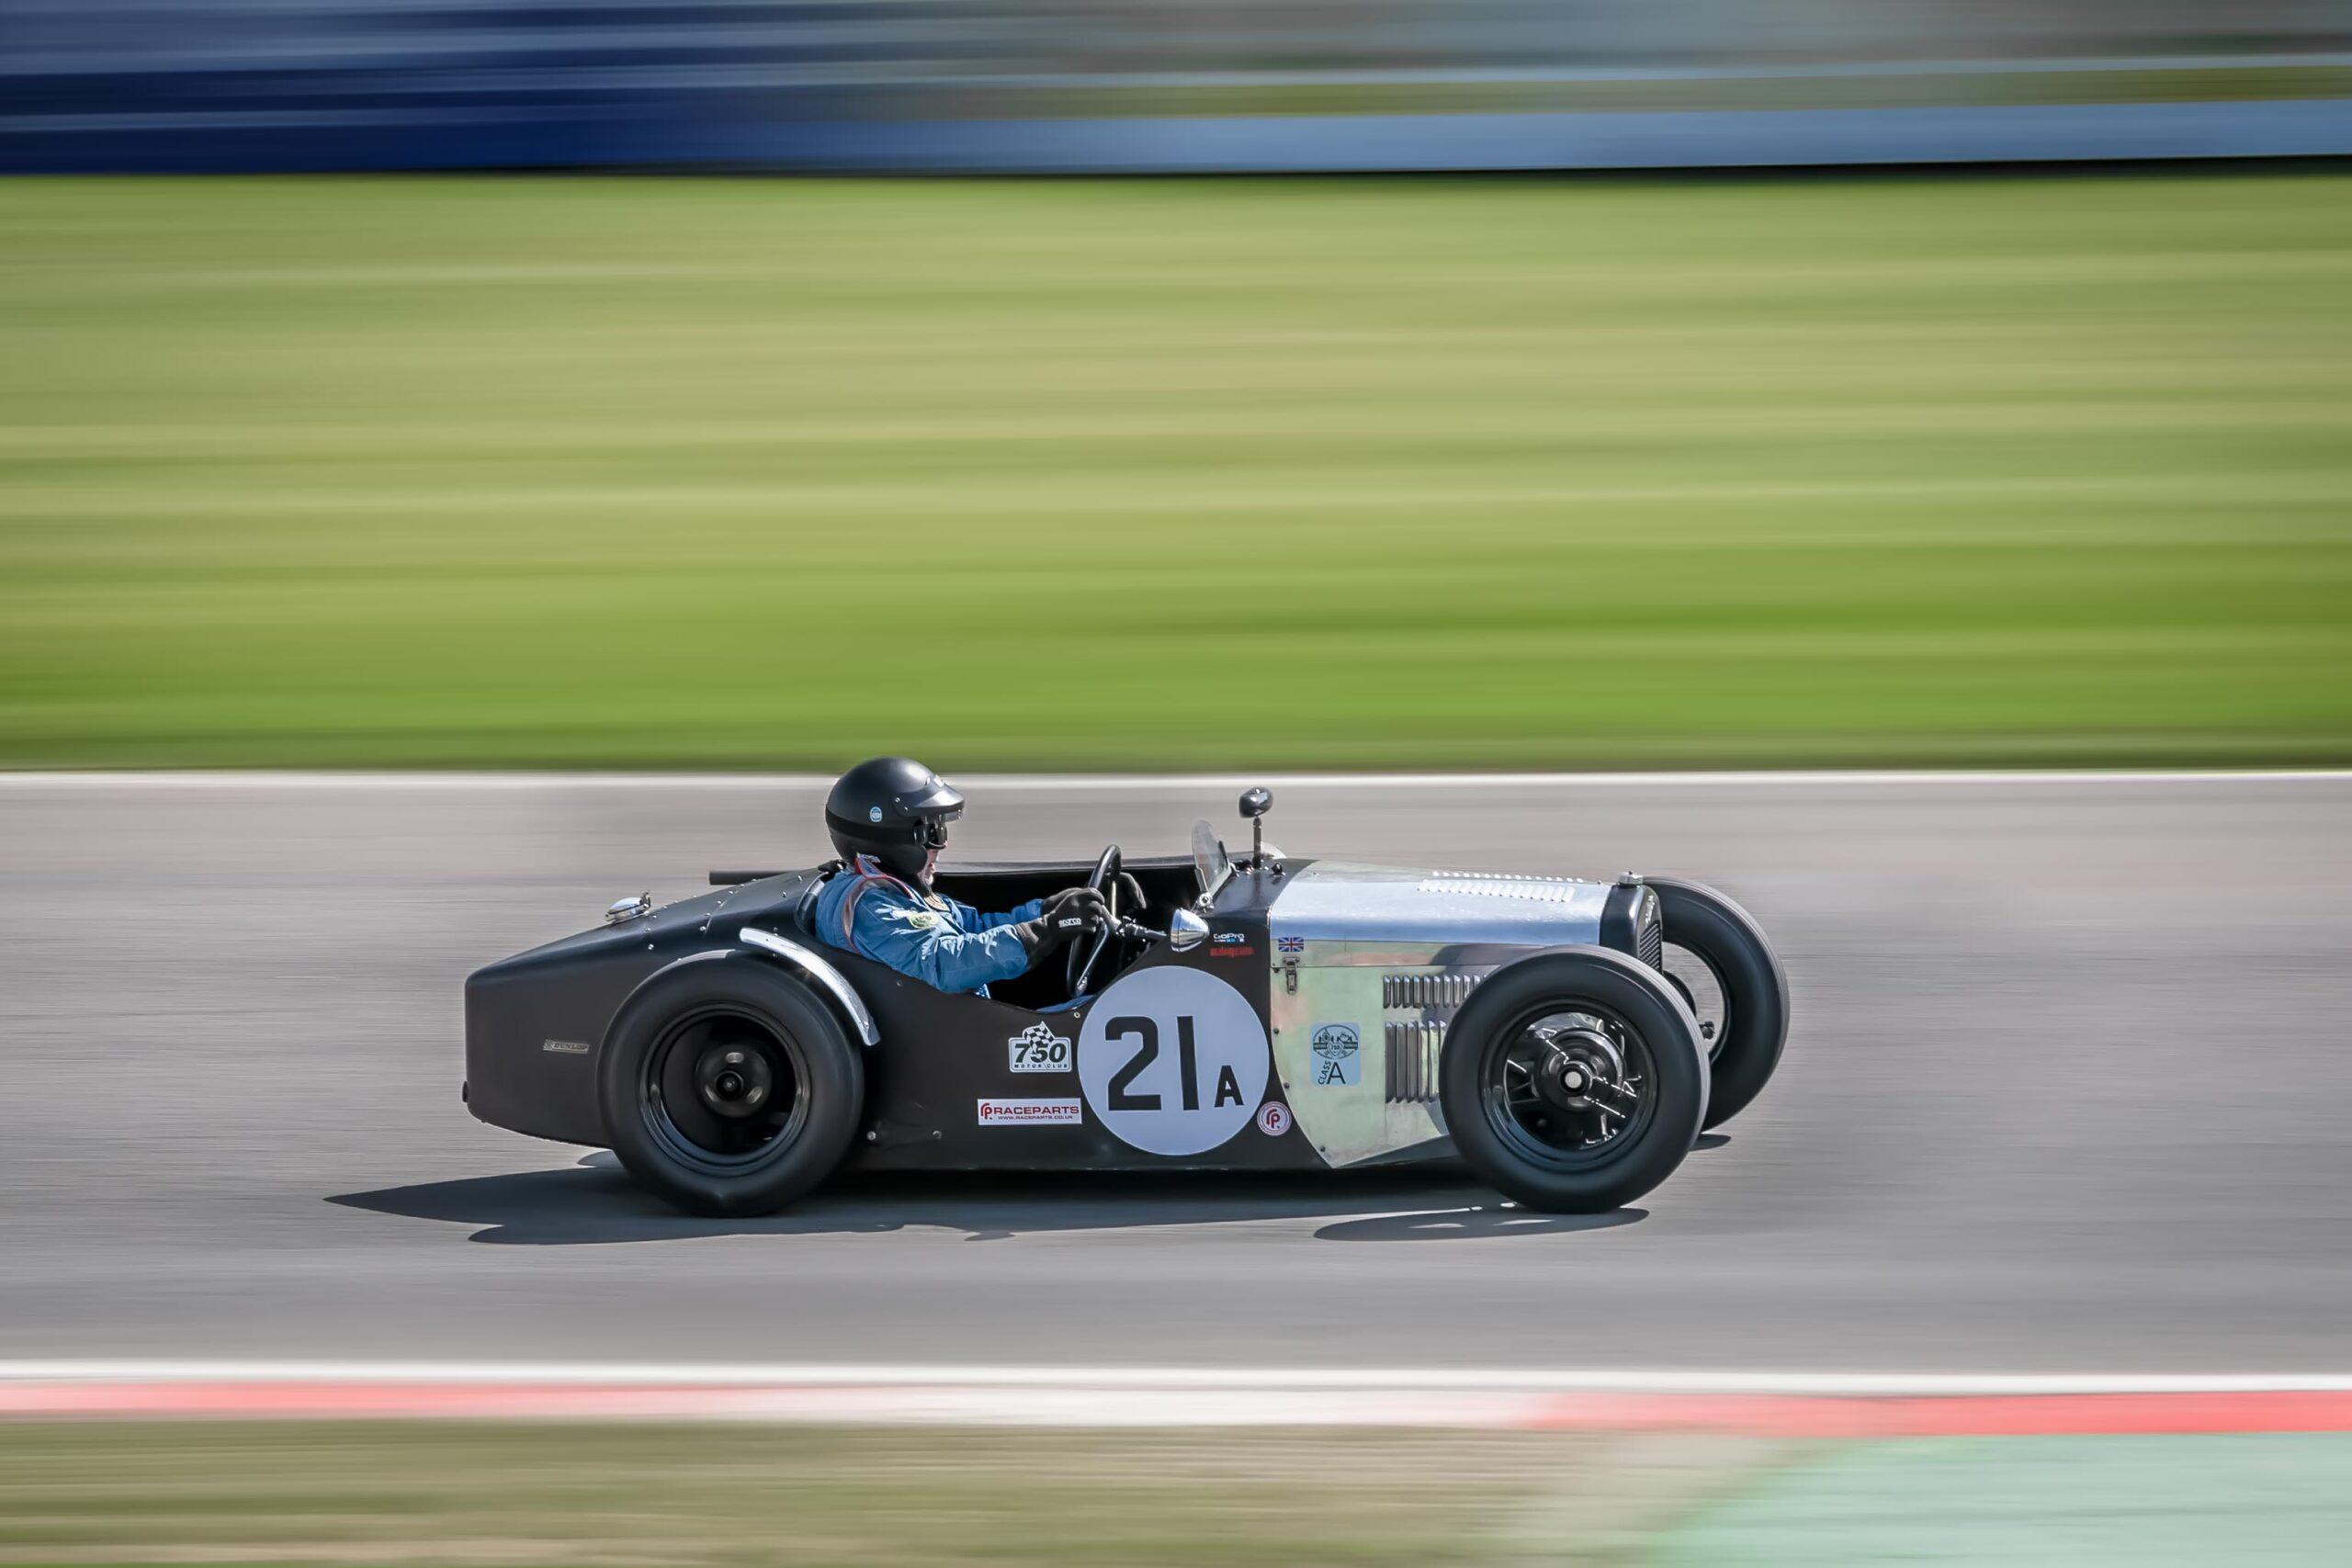 Austin Seven Special racer car